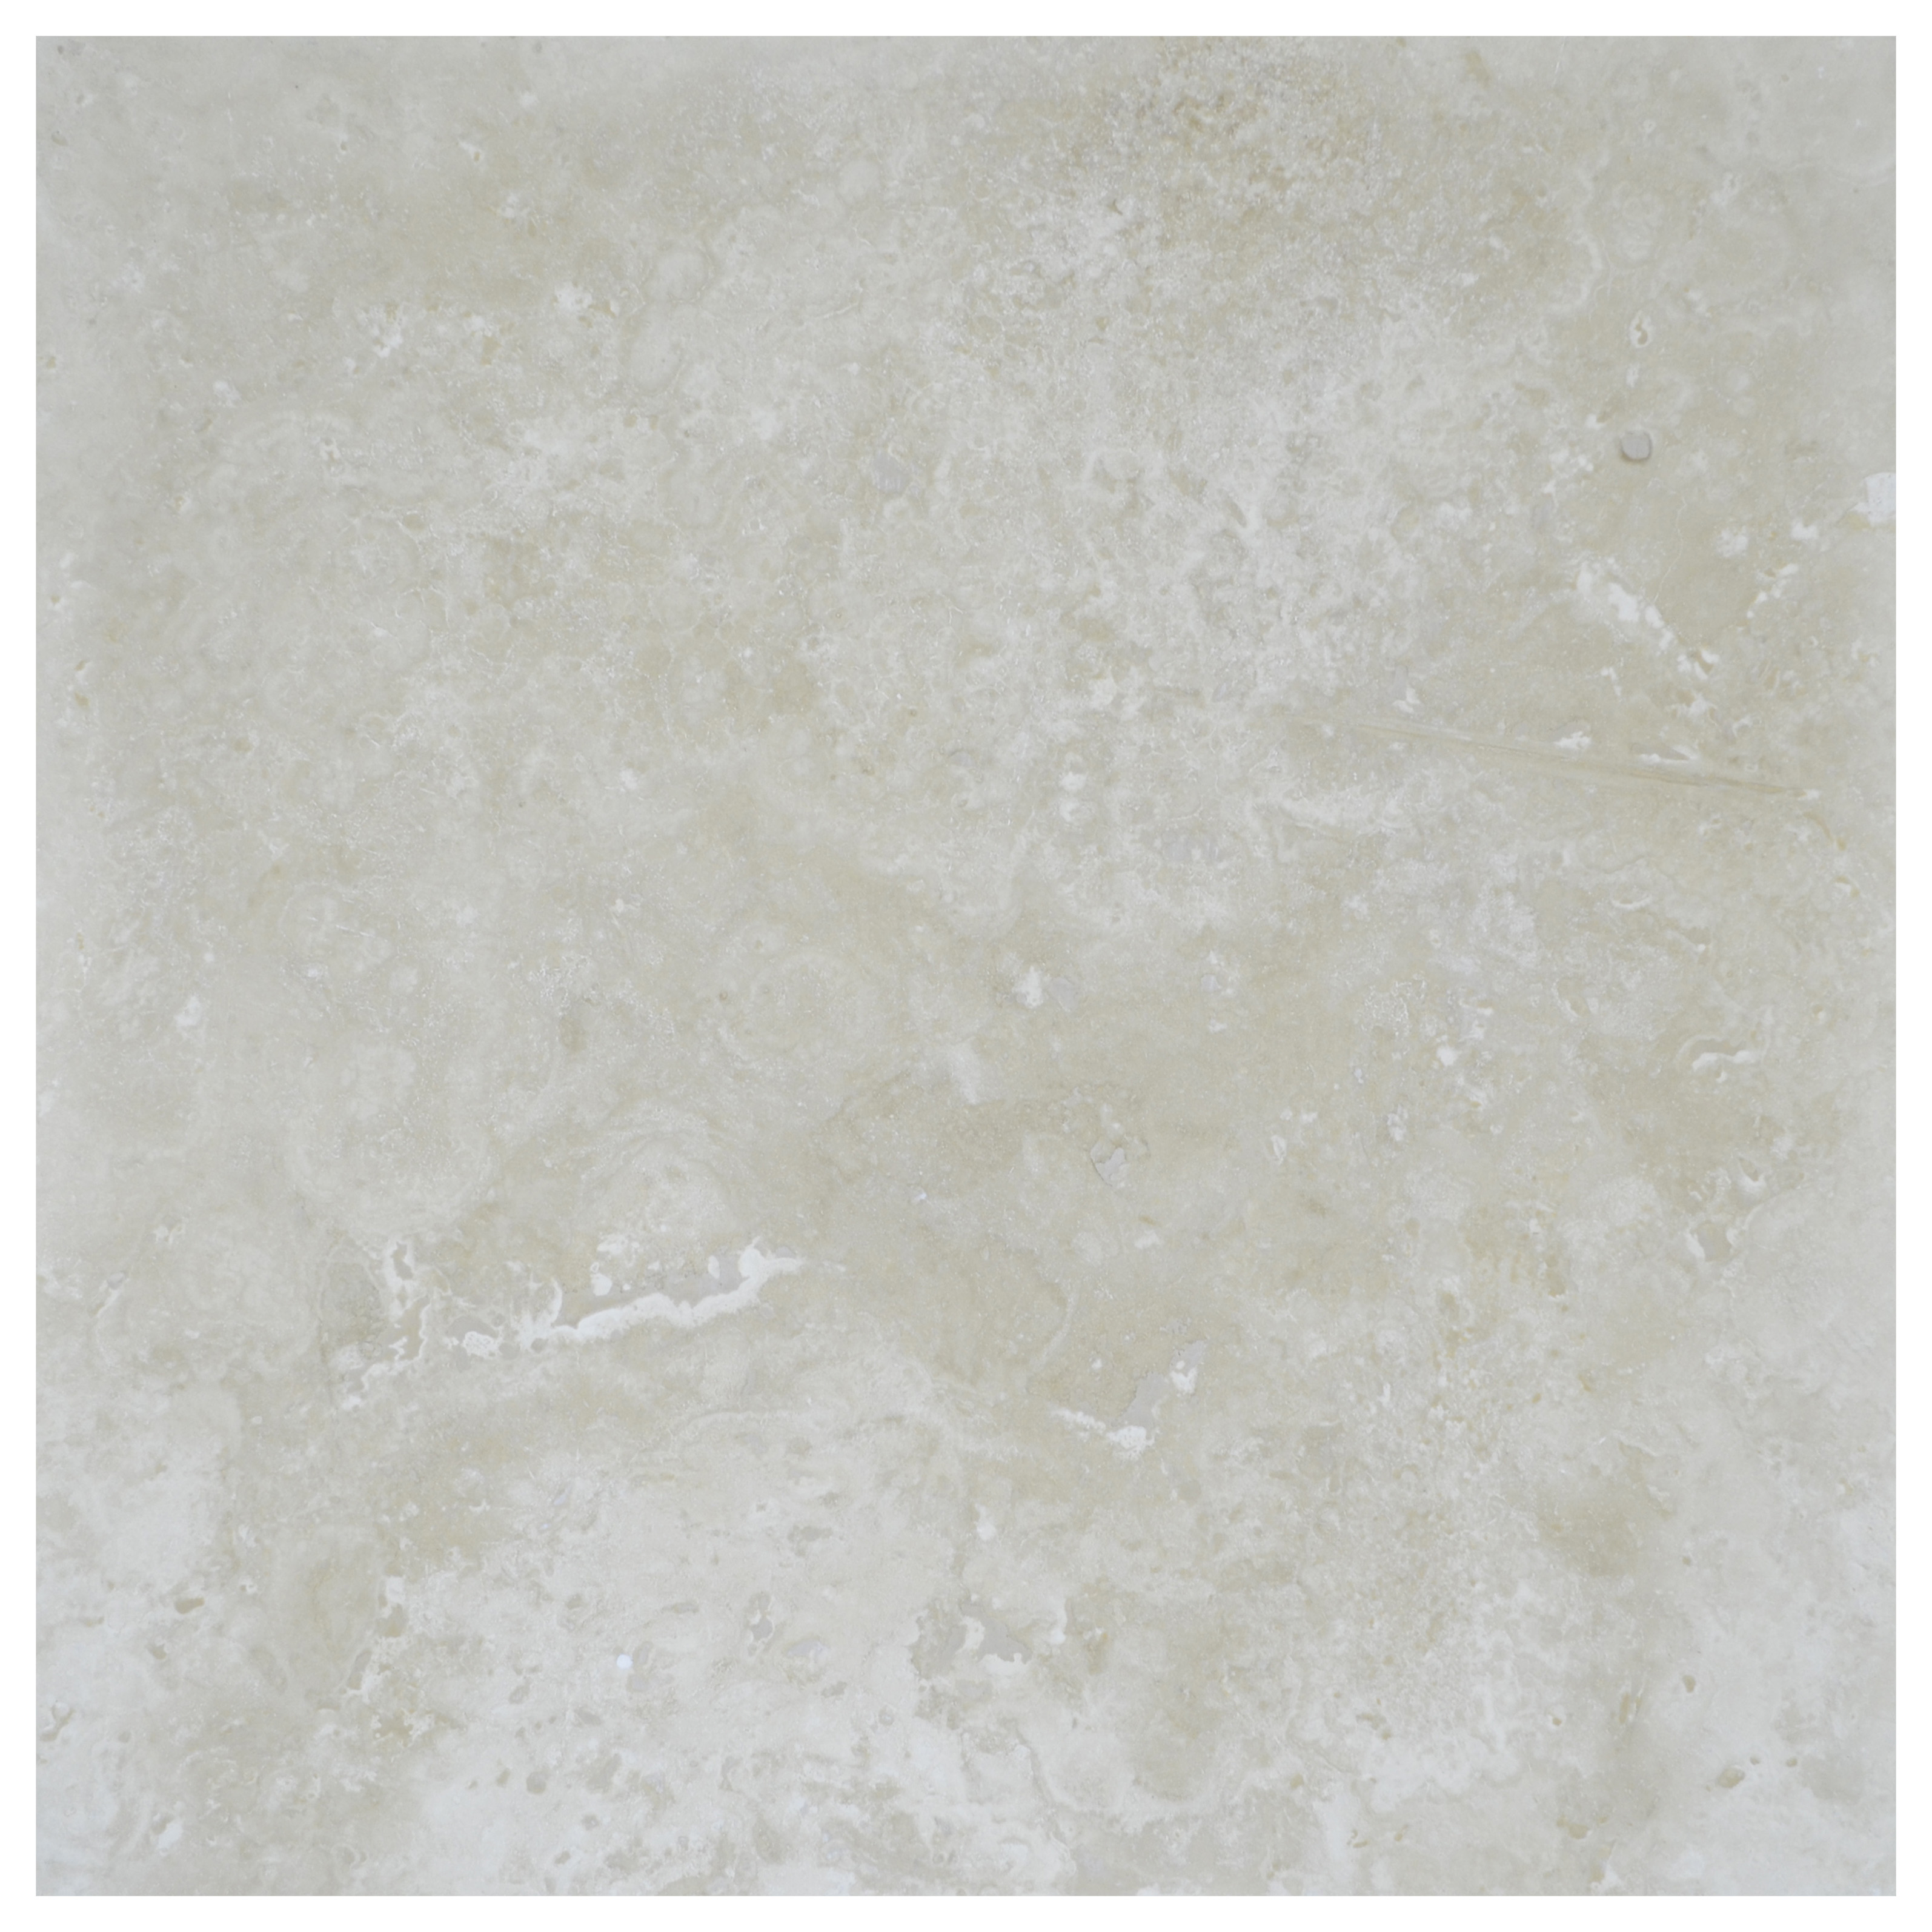 Amon Light Honed Filled Travertine Tiles 24x24-Travertine tiles sale-Atlantic Stone Source